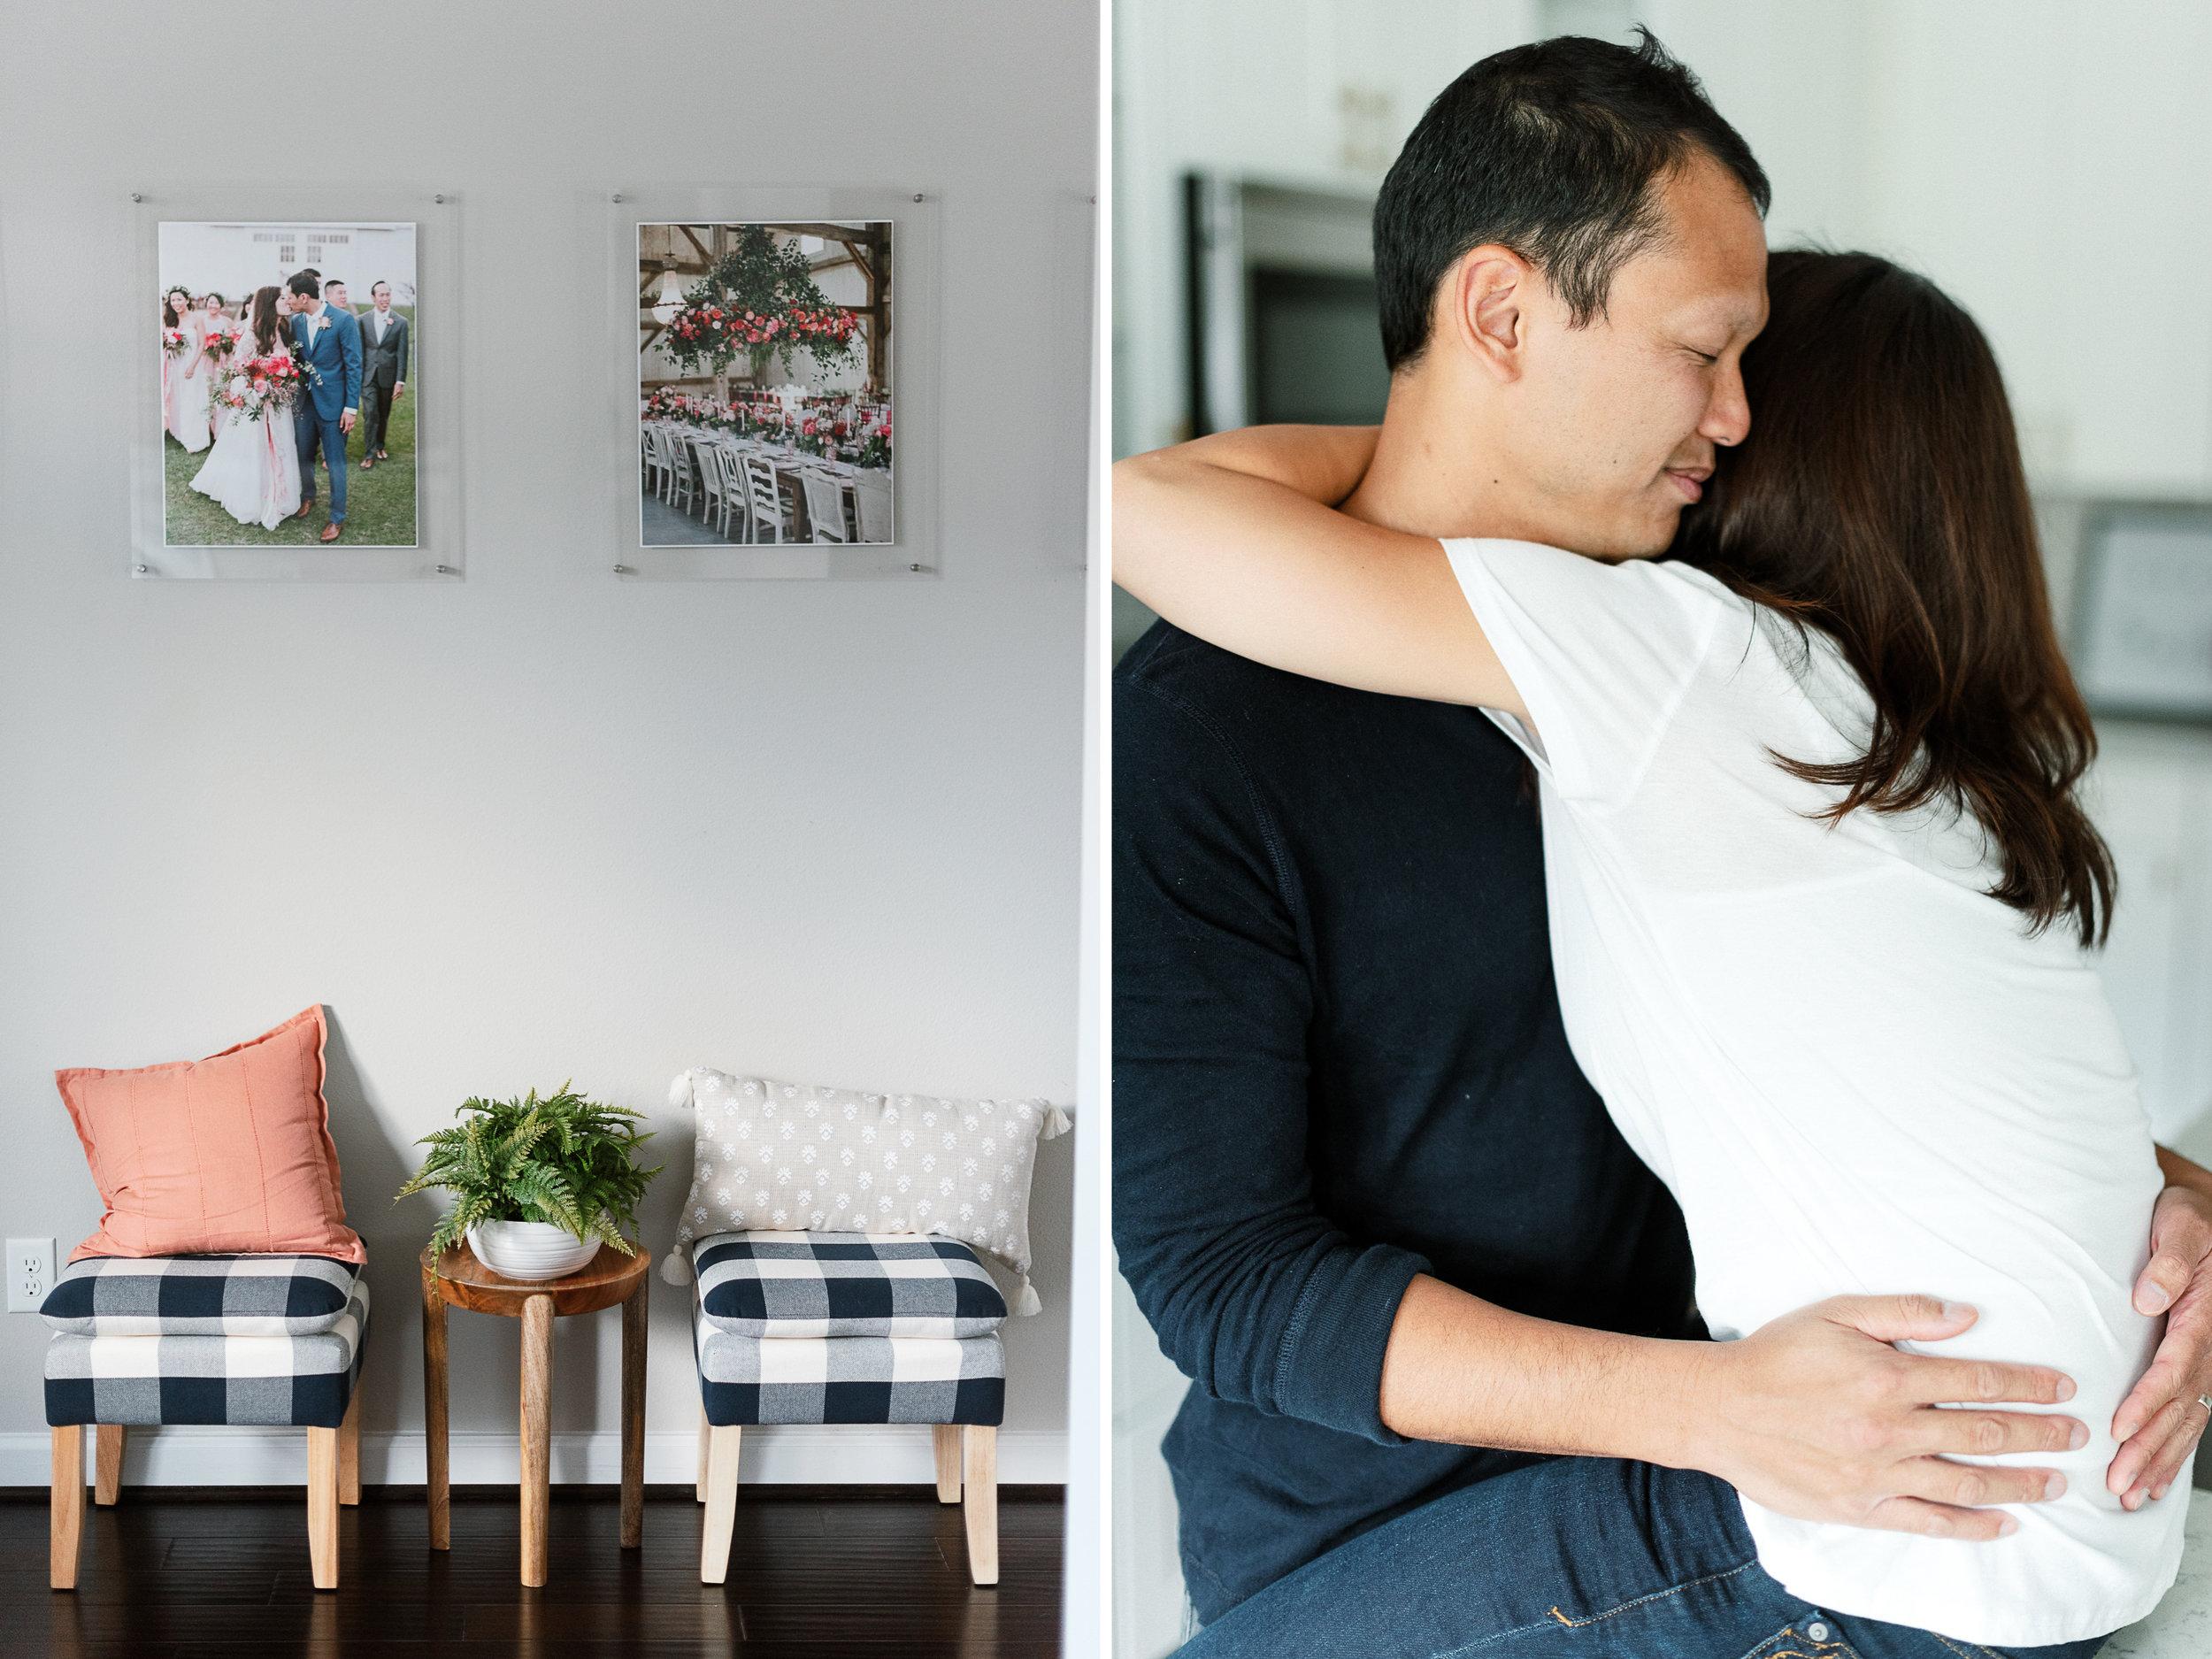 Houston-Wedding-Photographer-Best-Top-Luxury-Destination-Engagements-Portrait-Austin-Photography-106.jpg